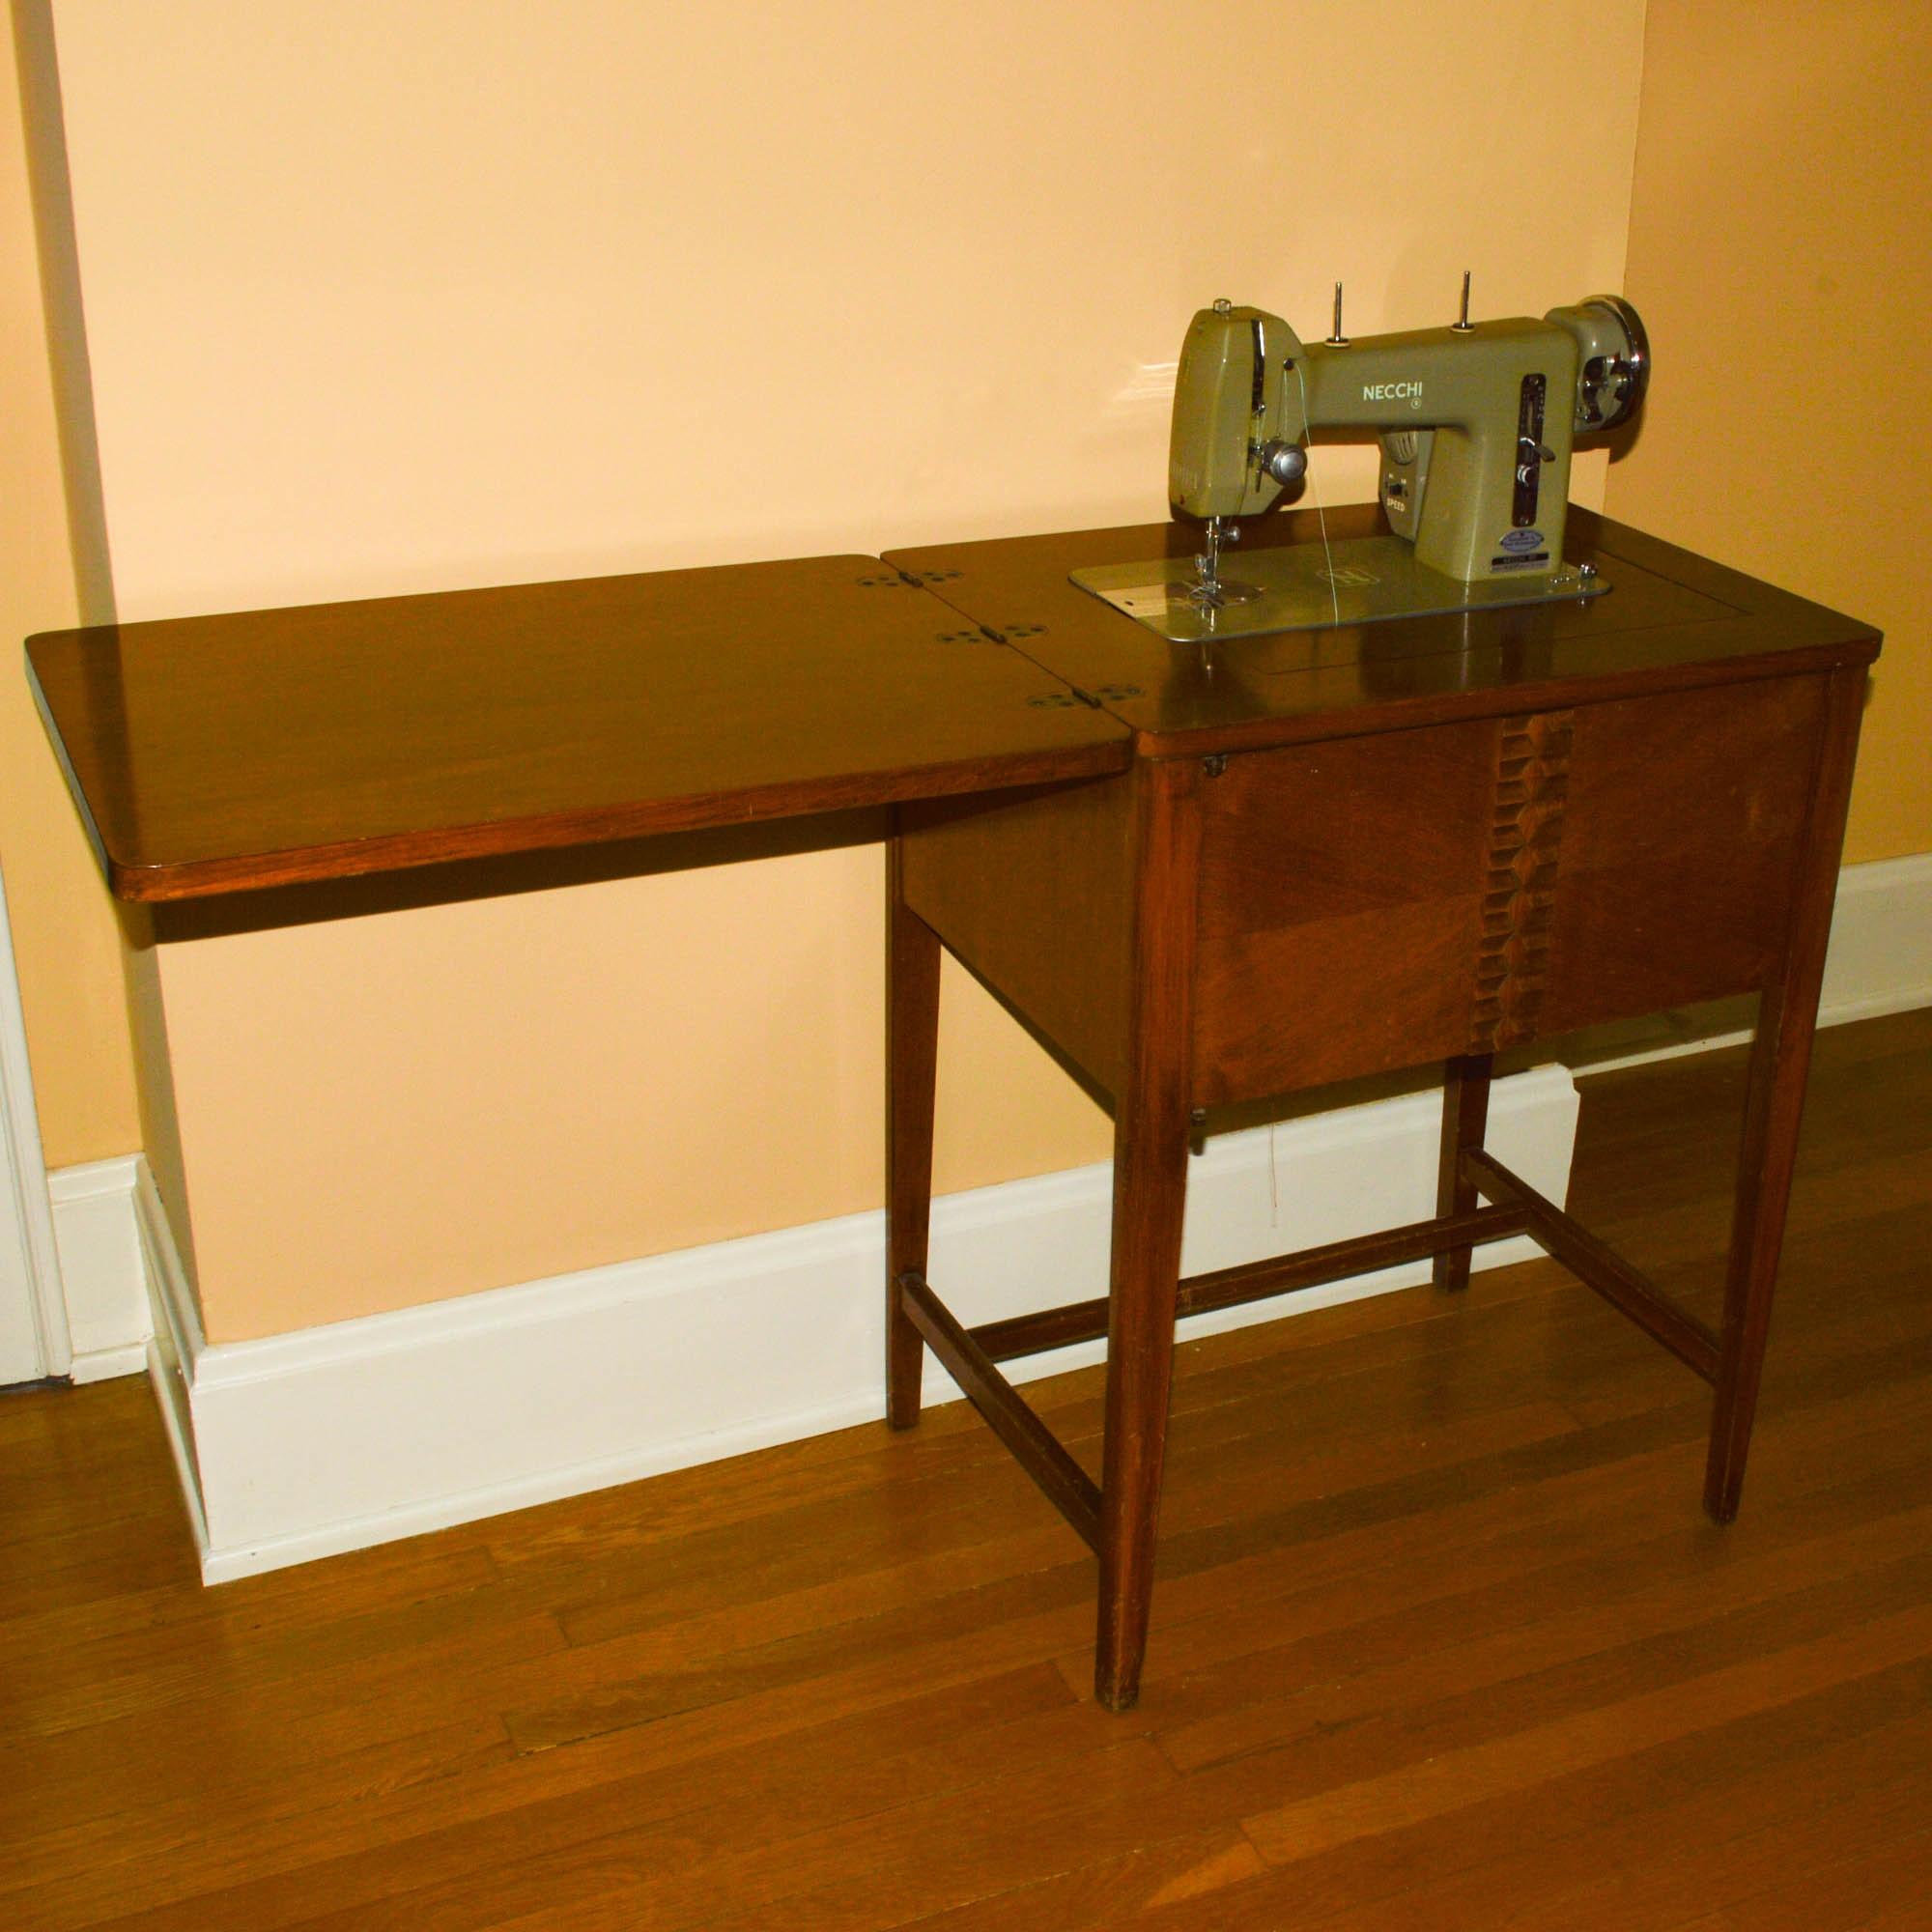 Vintage Necchi BF Mira Sewing Machine With Cabinet ... & Vintage Necchi BF Mira Sewing Machine With Cabinet : EBTH